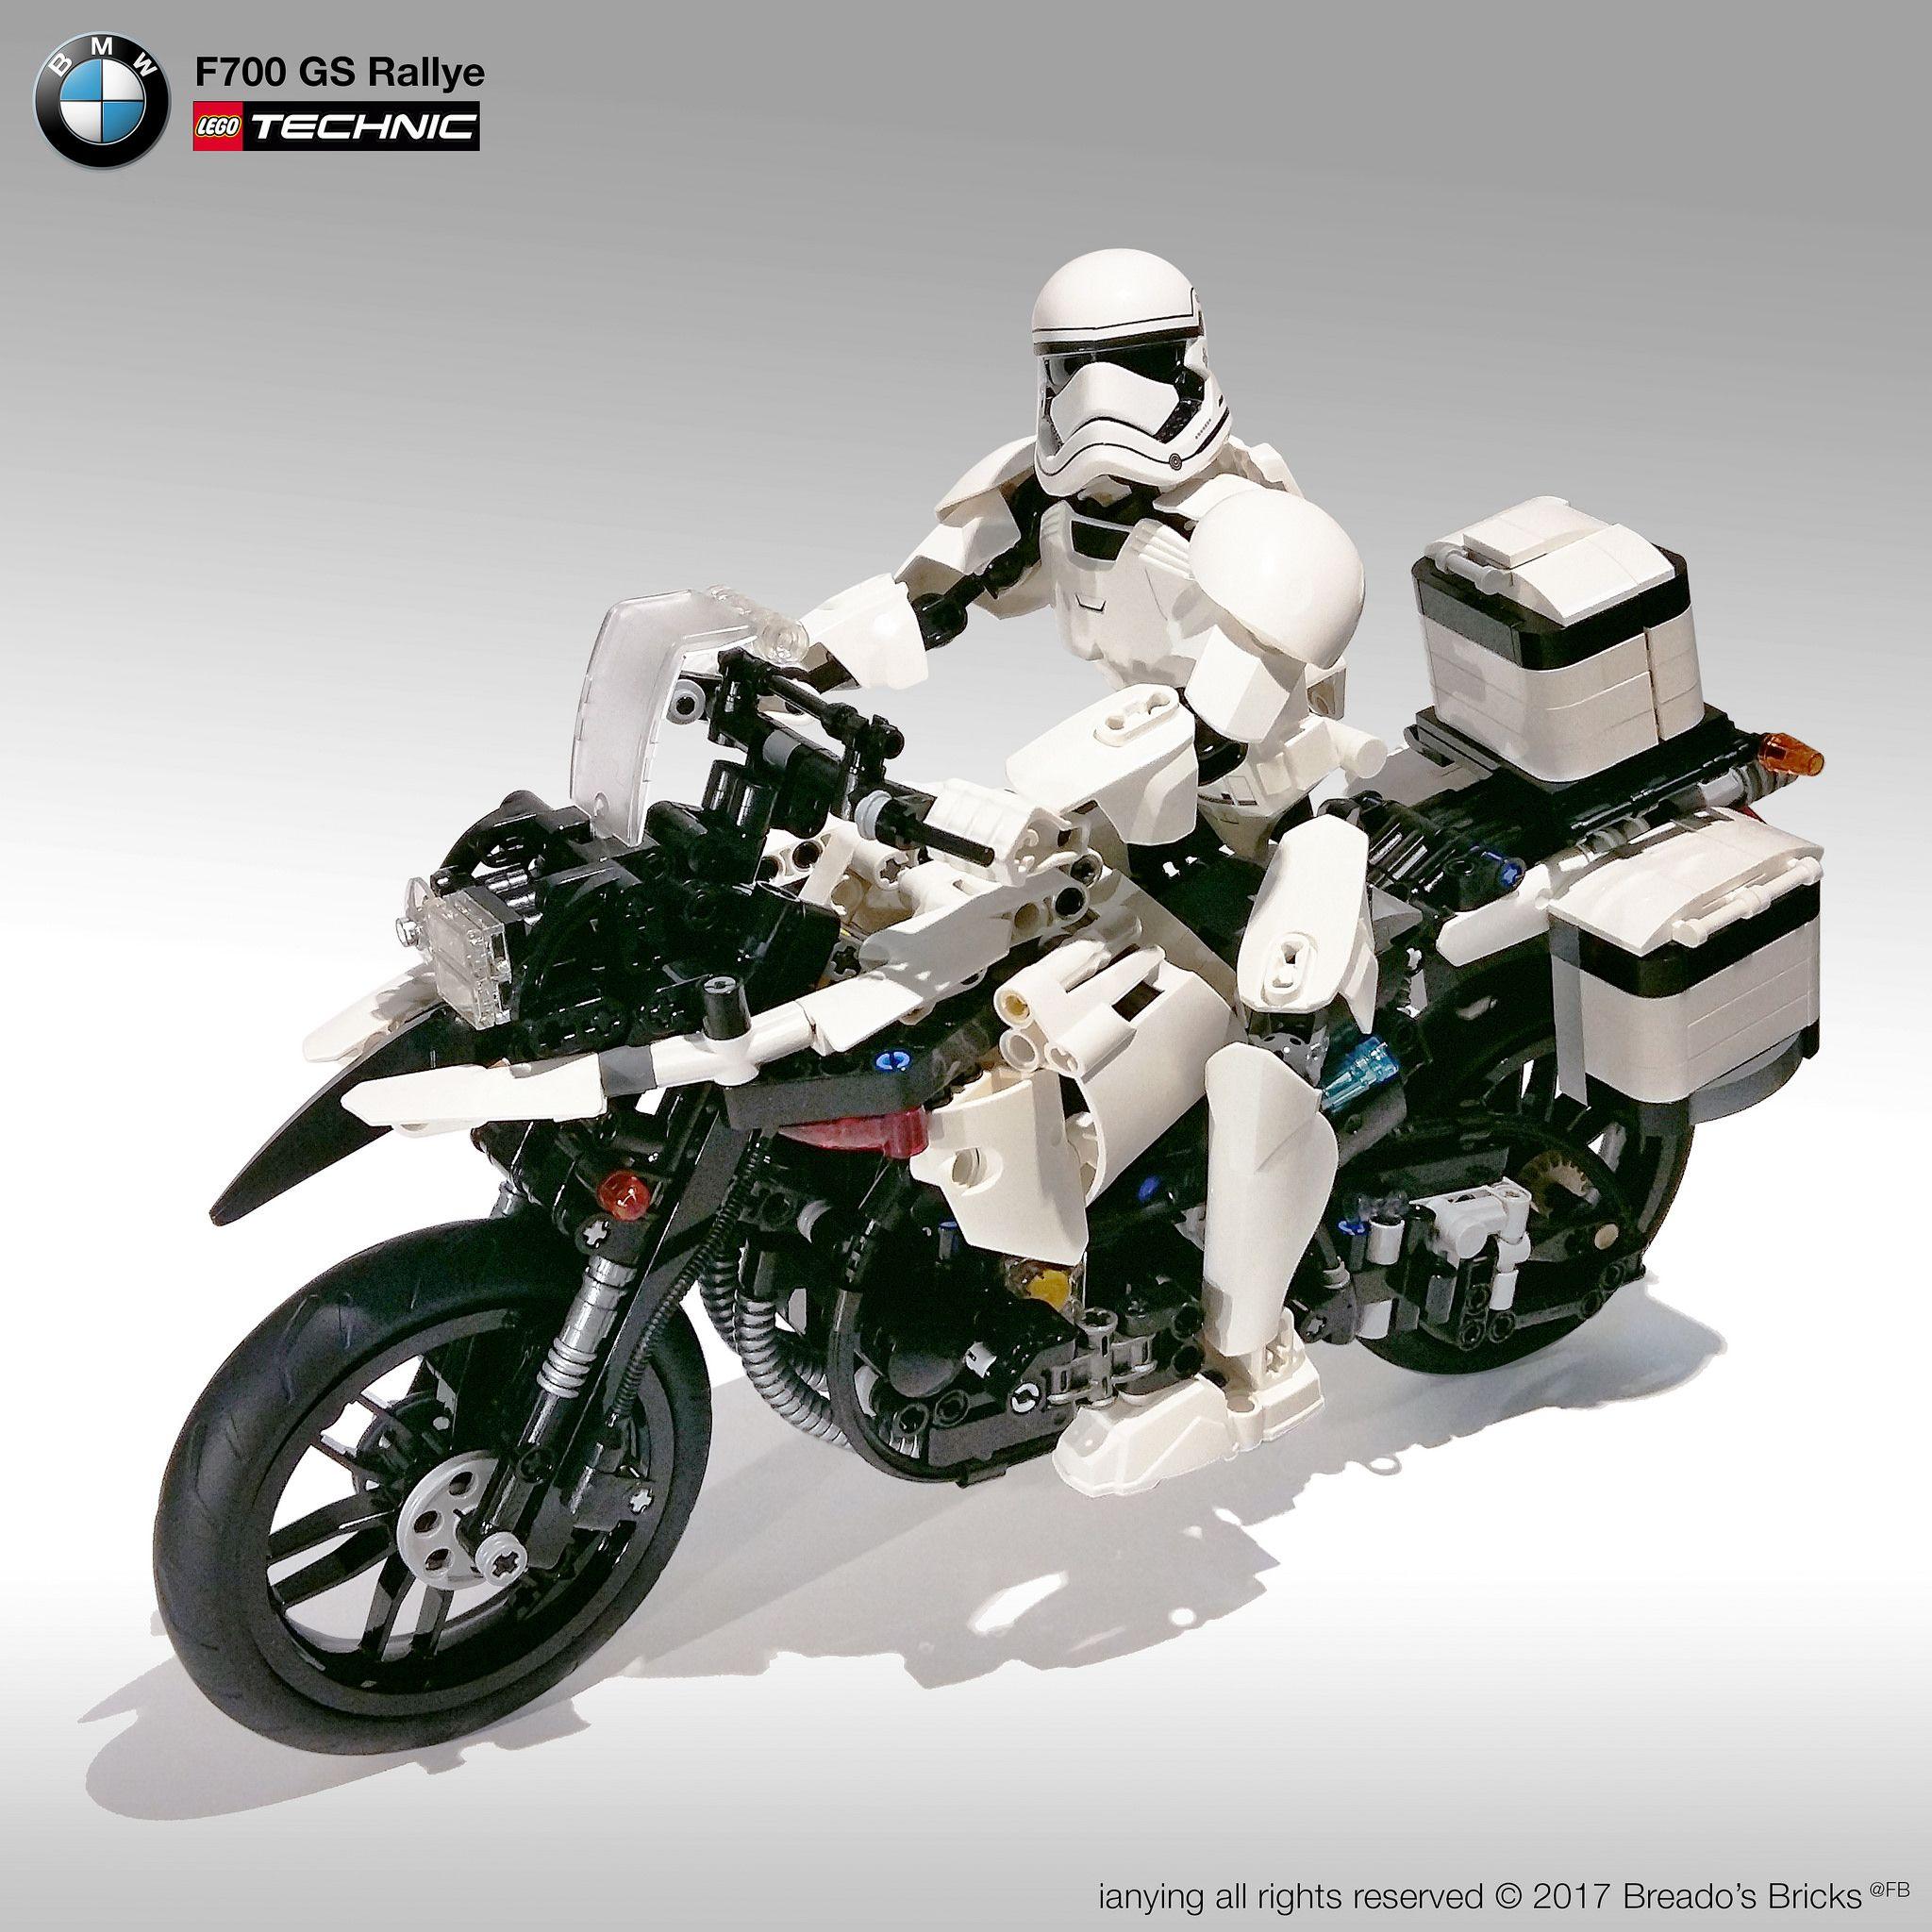 Trooper Bmw F700gs Rallye1 Bmw Trooper Cool Lego [ 2048 x 2048 Pixel ]